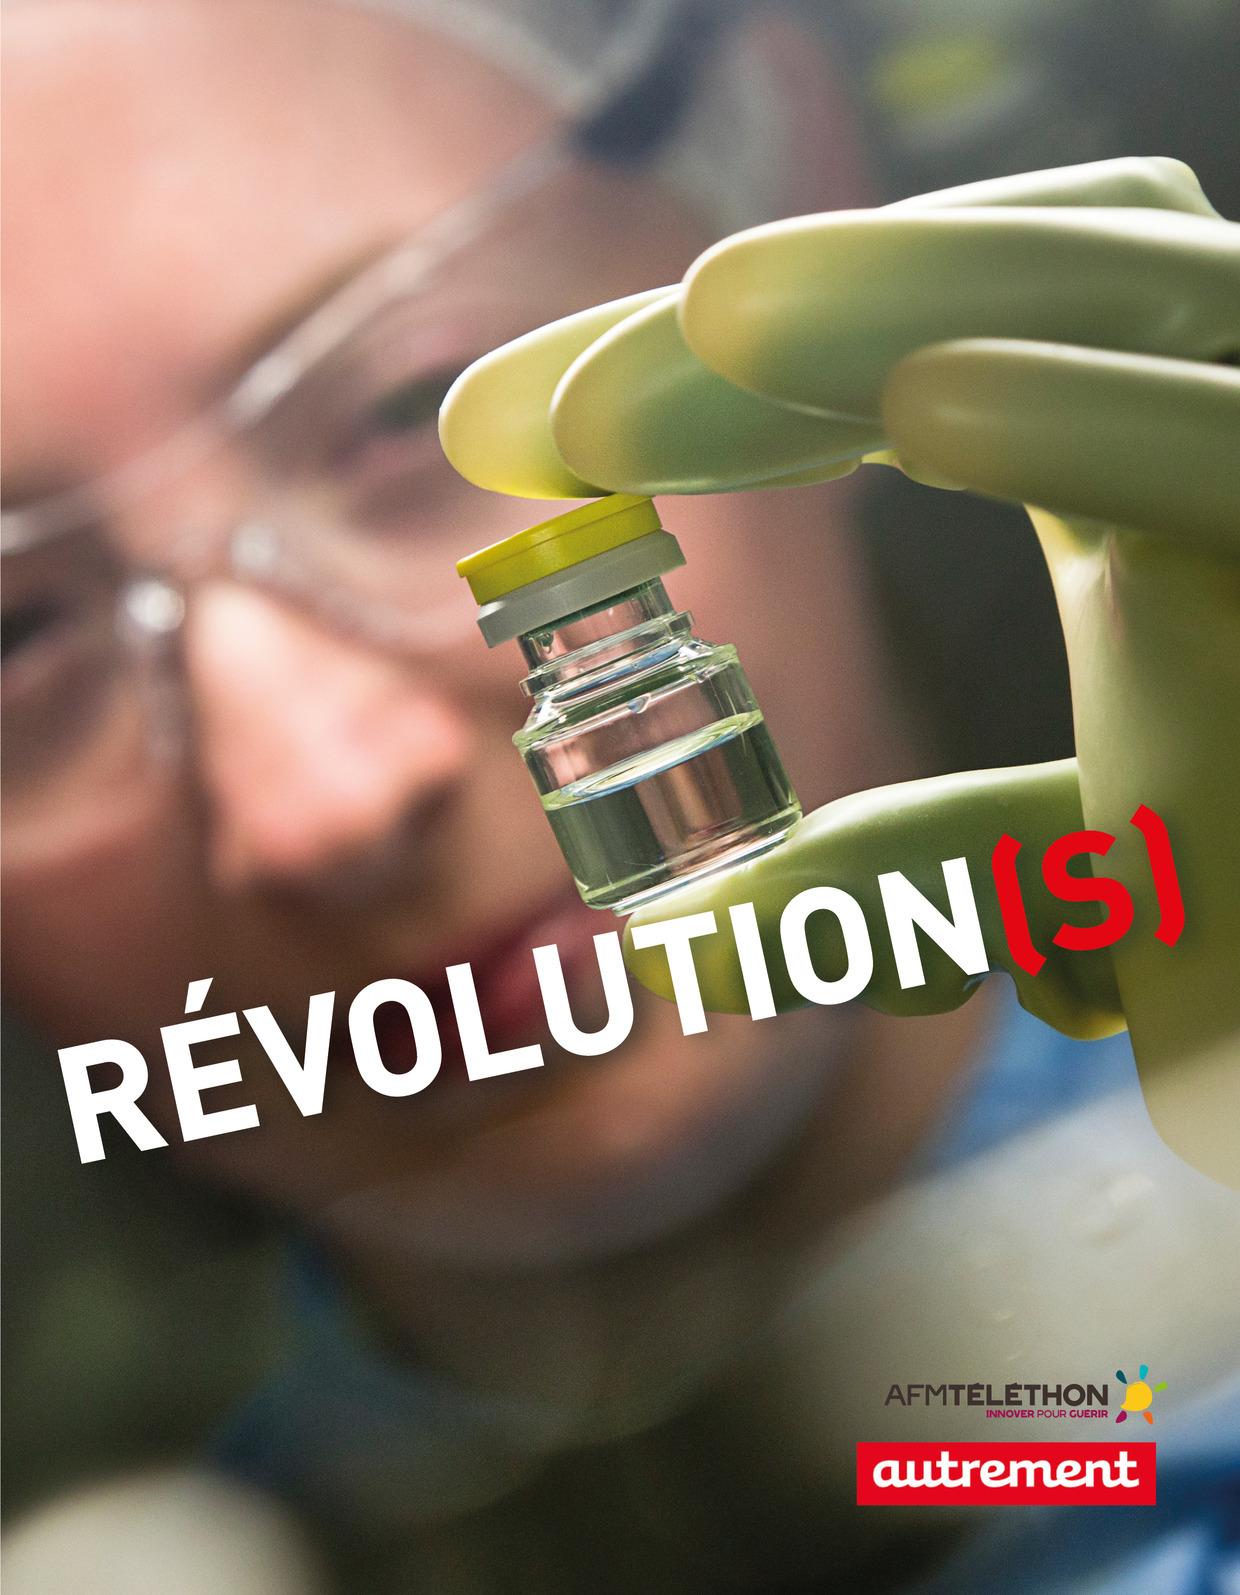 REVOLUTION(S)